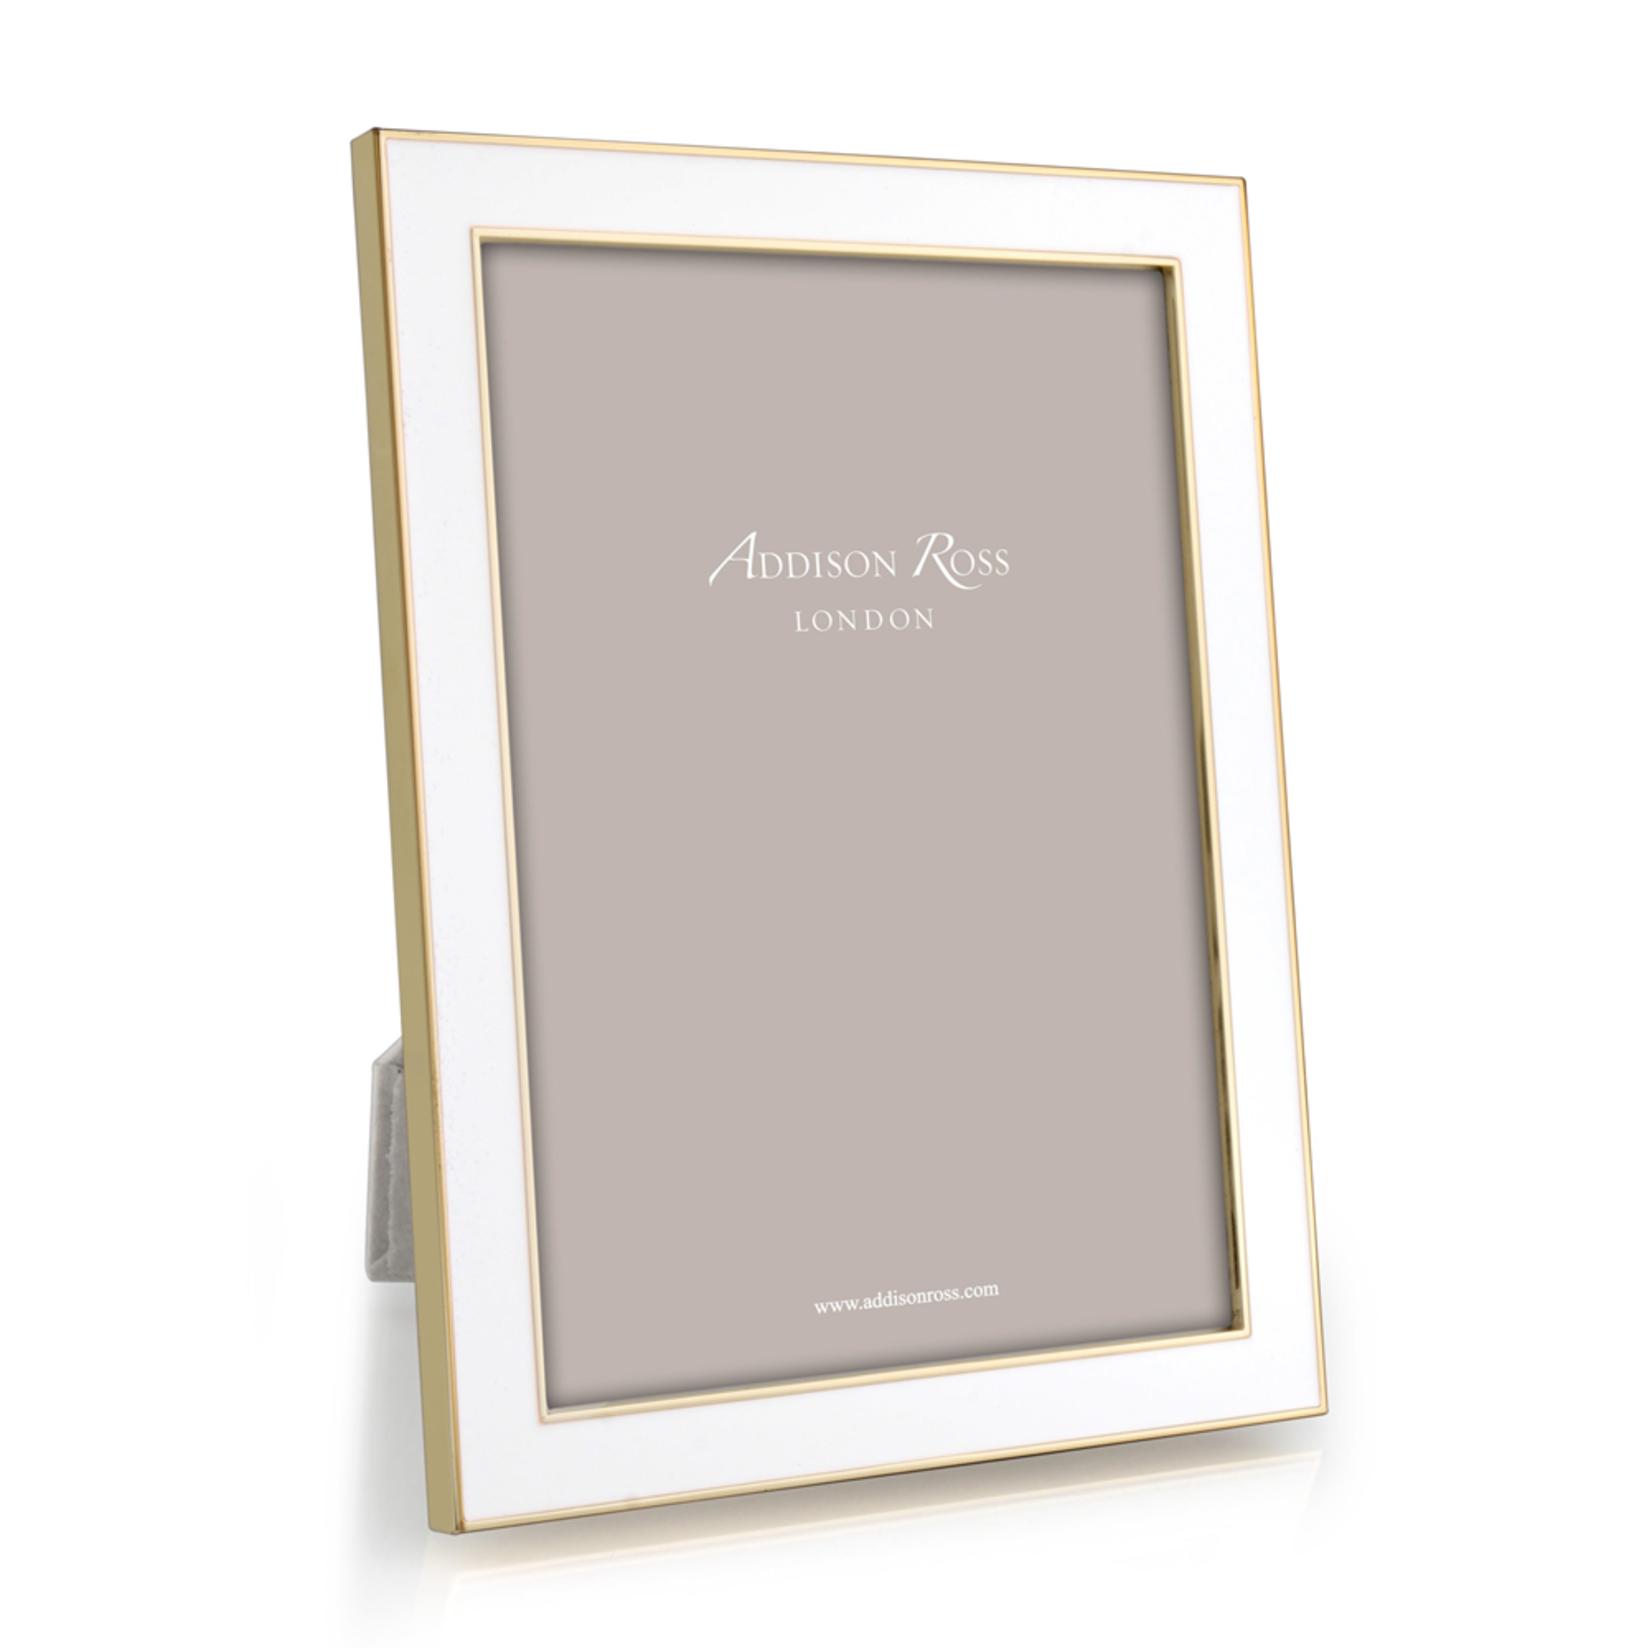 Addison Ross Colored Enamel & Gold Frame